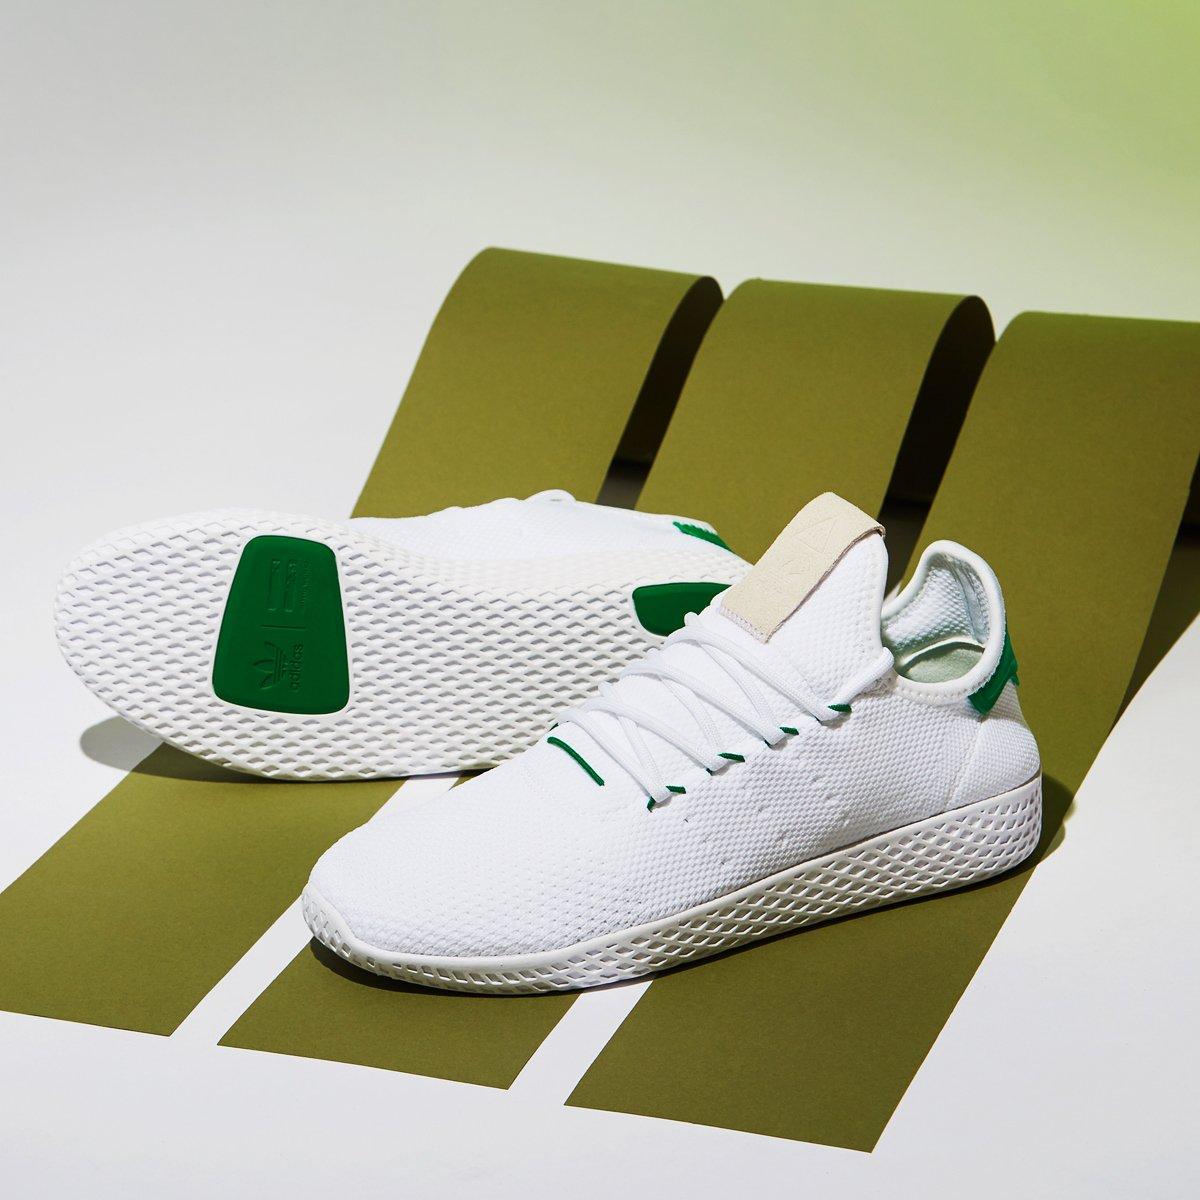 giay the thao Pharrell x adidas Originals Tennis Hu - elle man